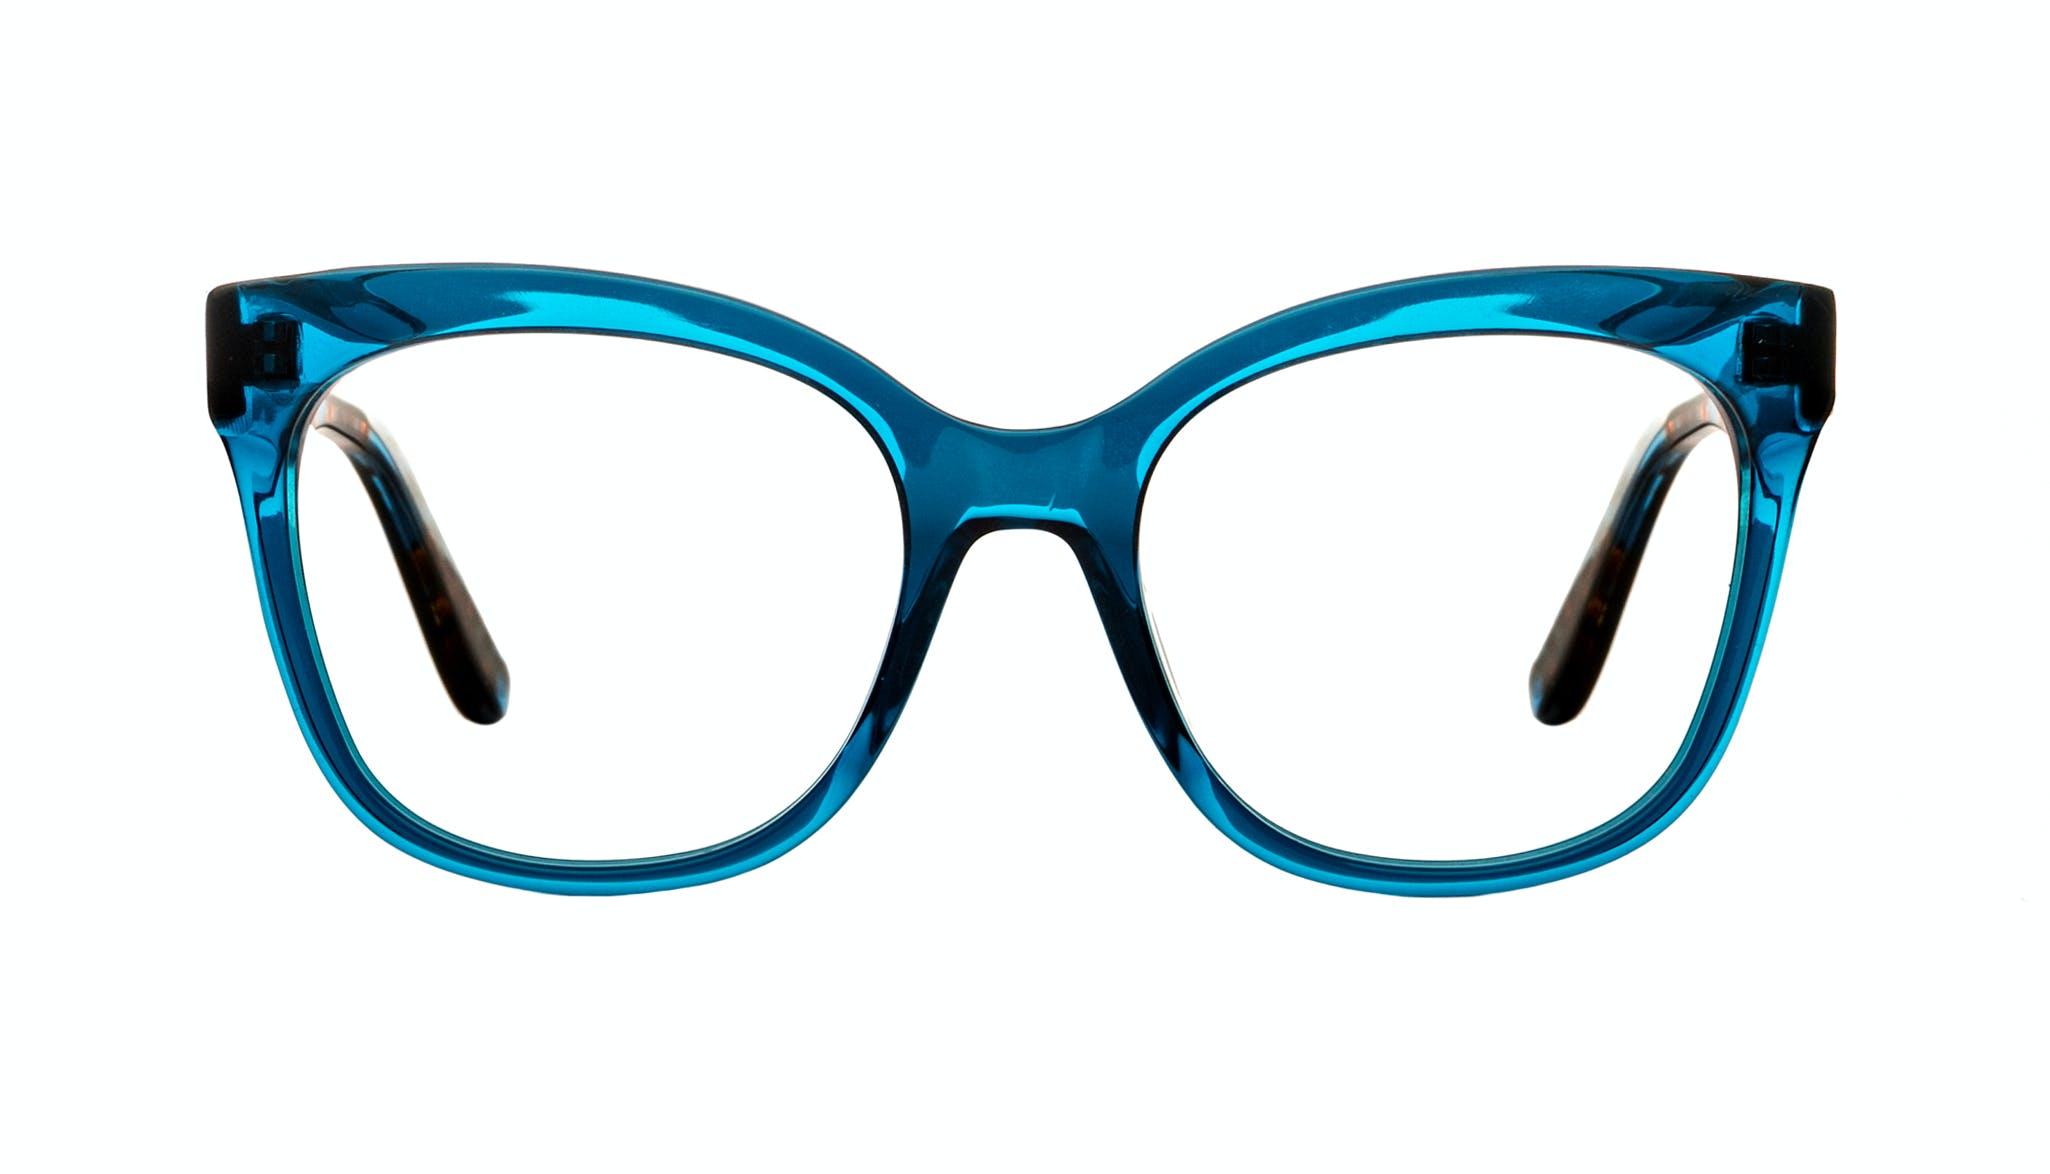 Affordable Fashion Glasses Square Eyeglasses Women Breezy Blue Wonder Front